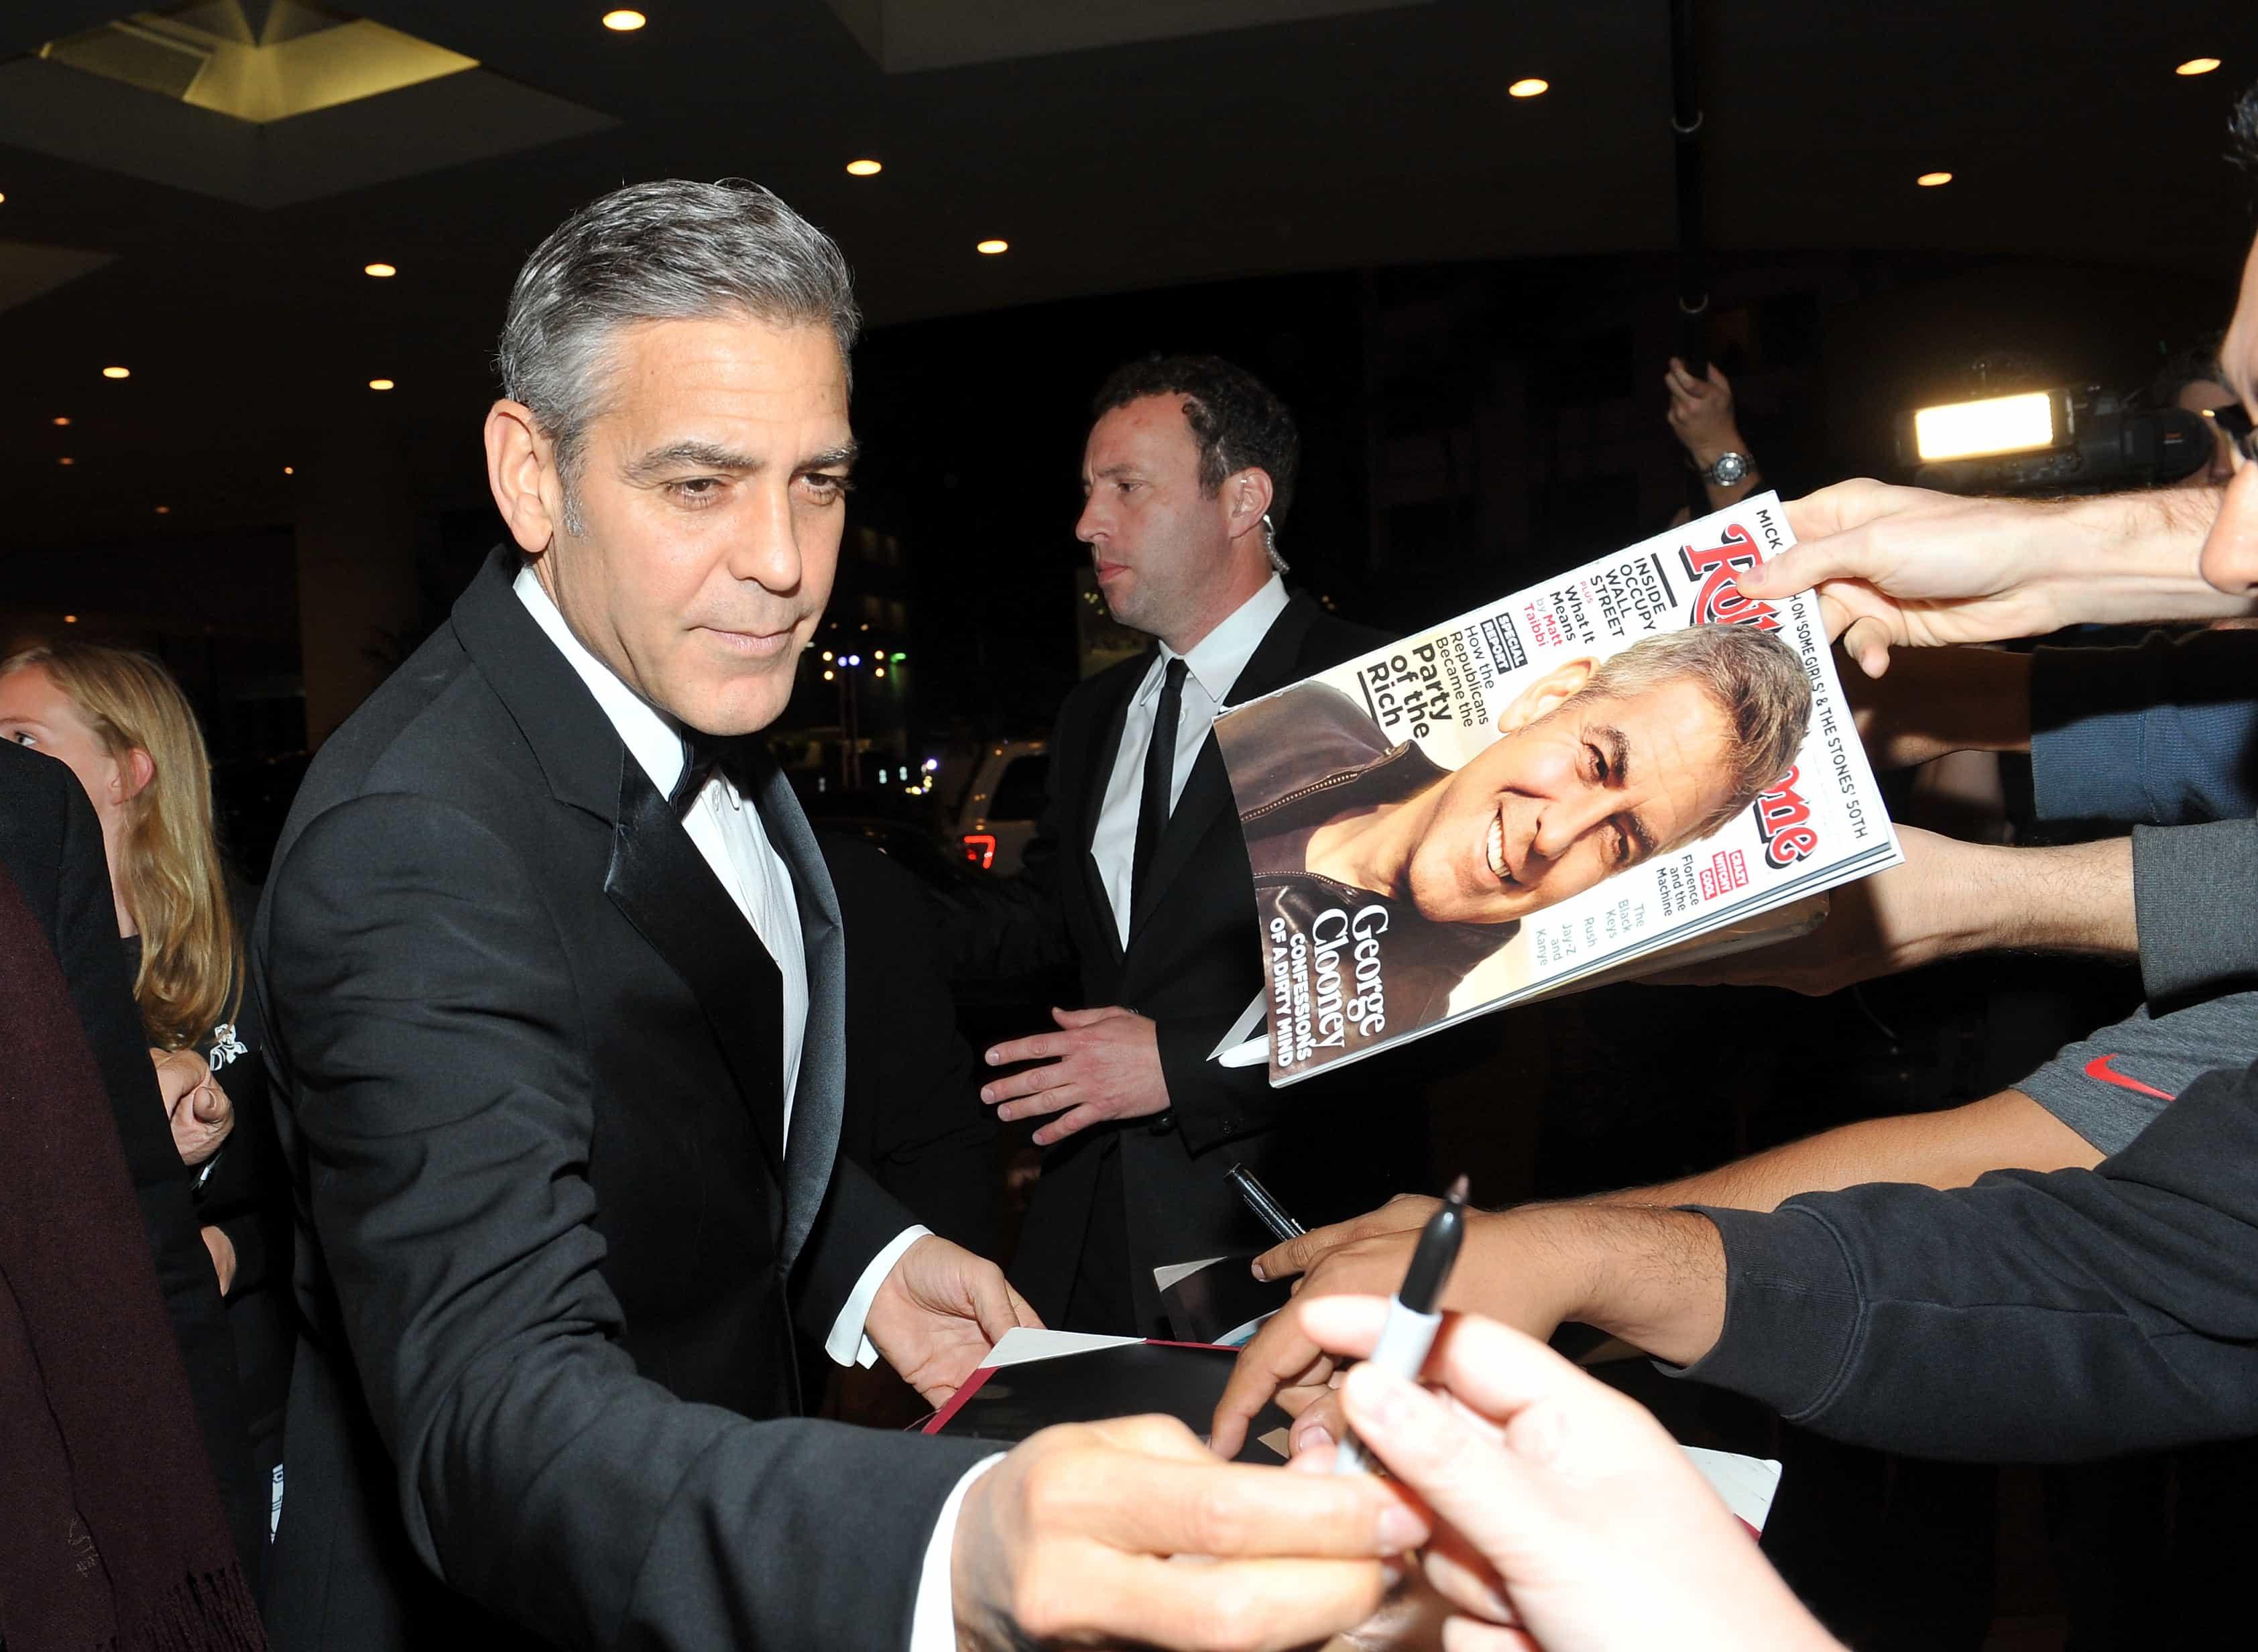 TGeorge Clooney